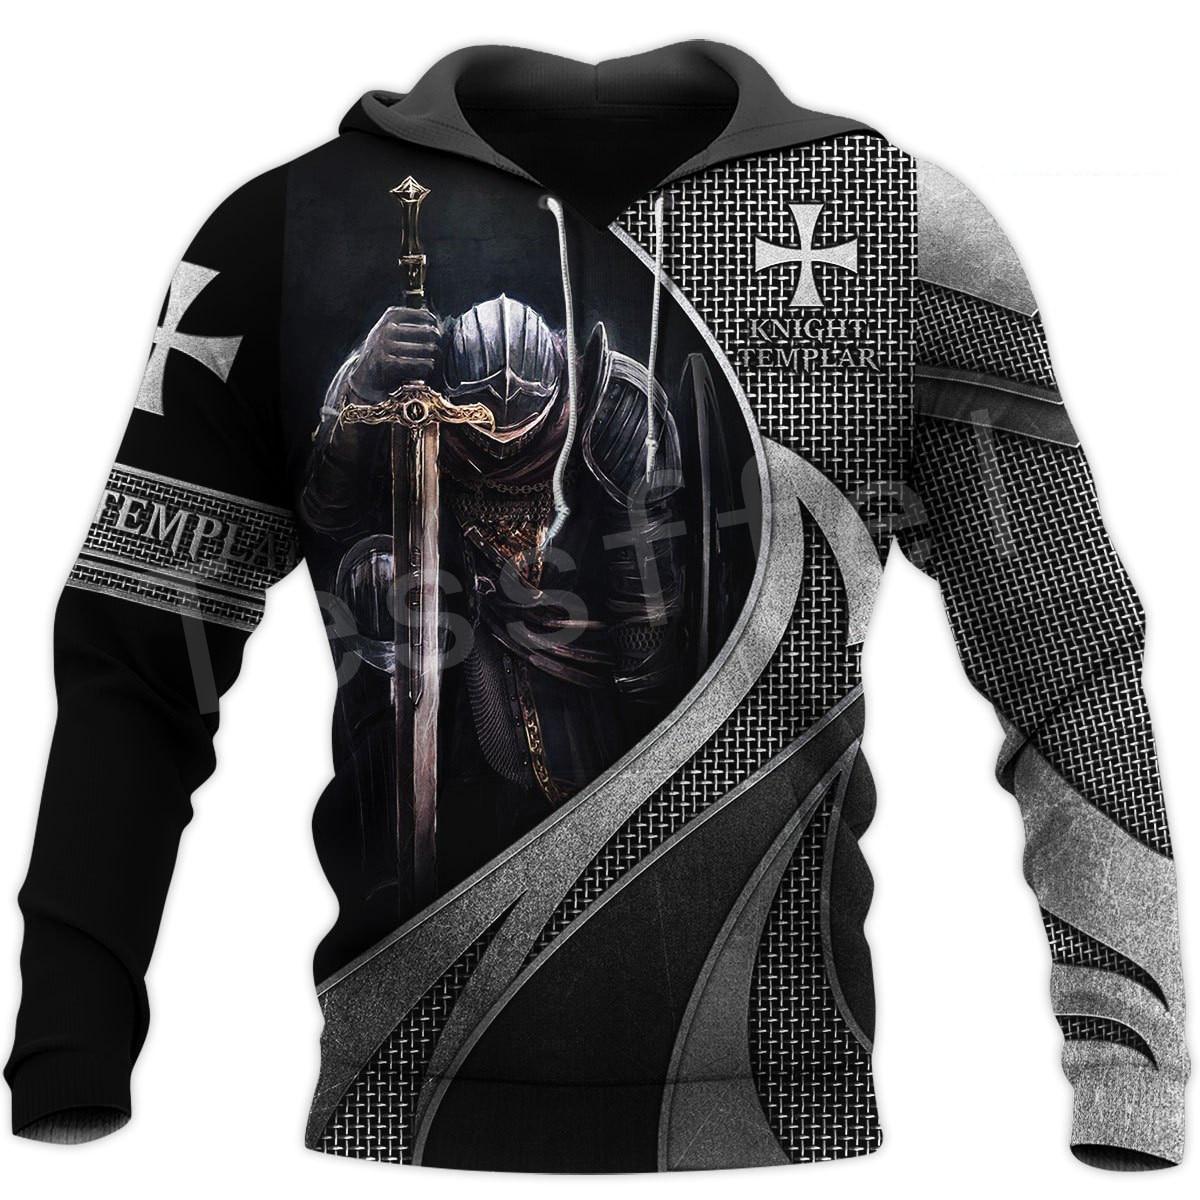 Tessffel Knight Templar Armor Streetwear Harajuku Pullover NewFashion Funny 3DPrint Zip/Hoodies/Sweatshirts/Jacket/Men/Women A-9